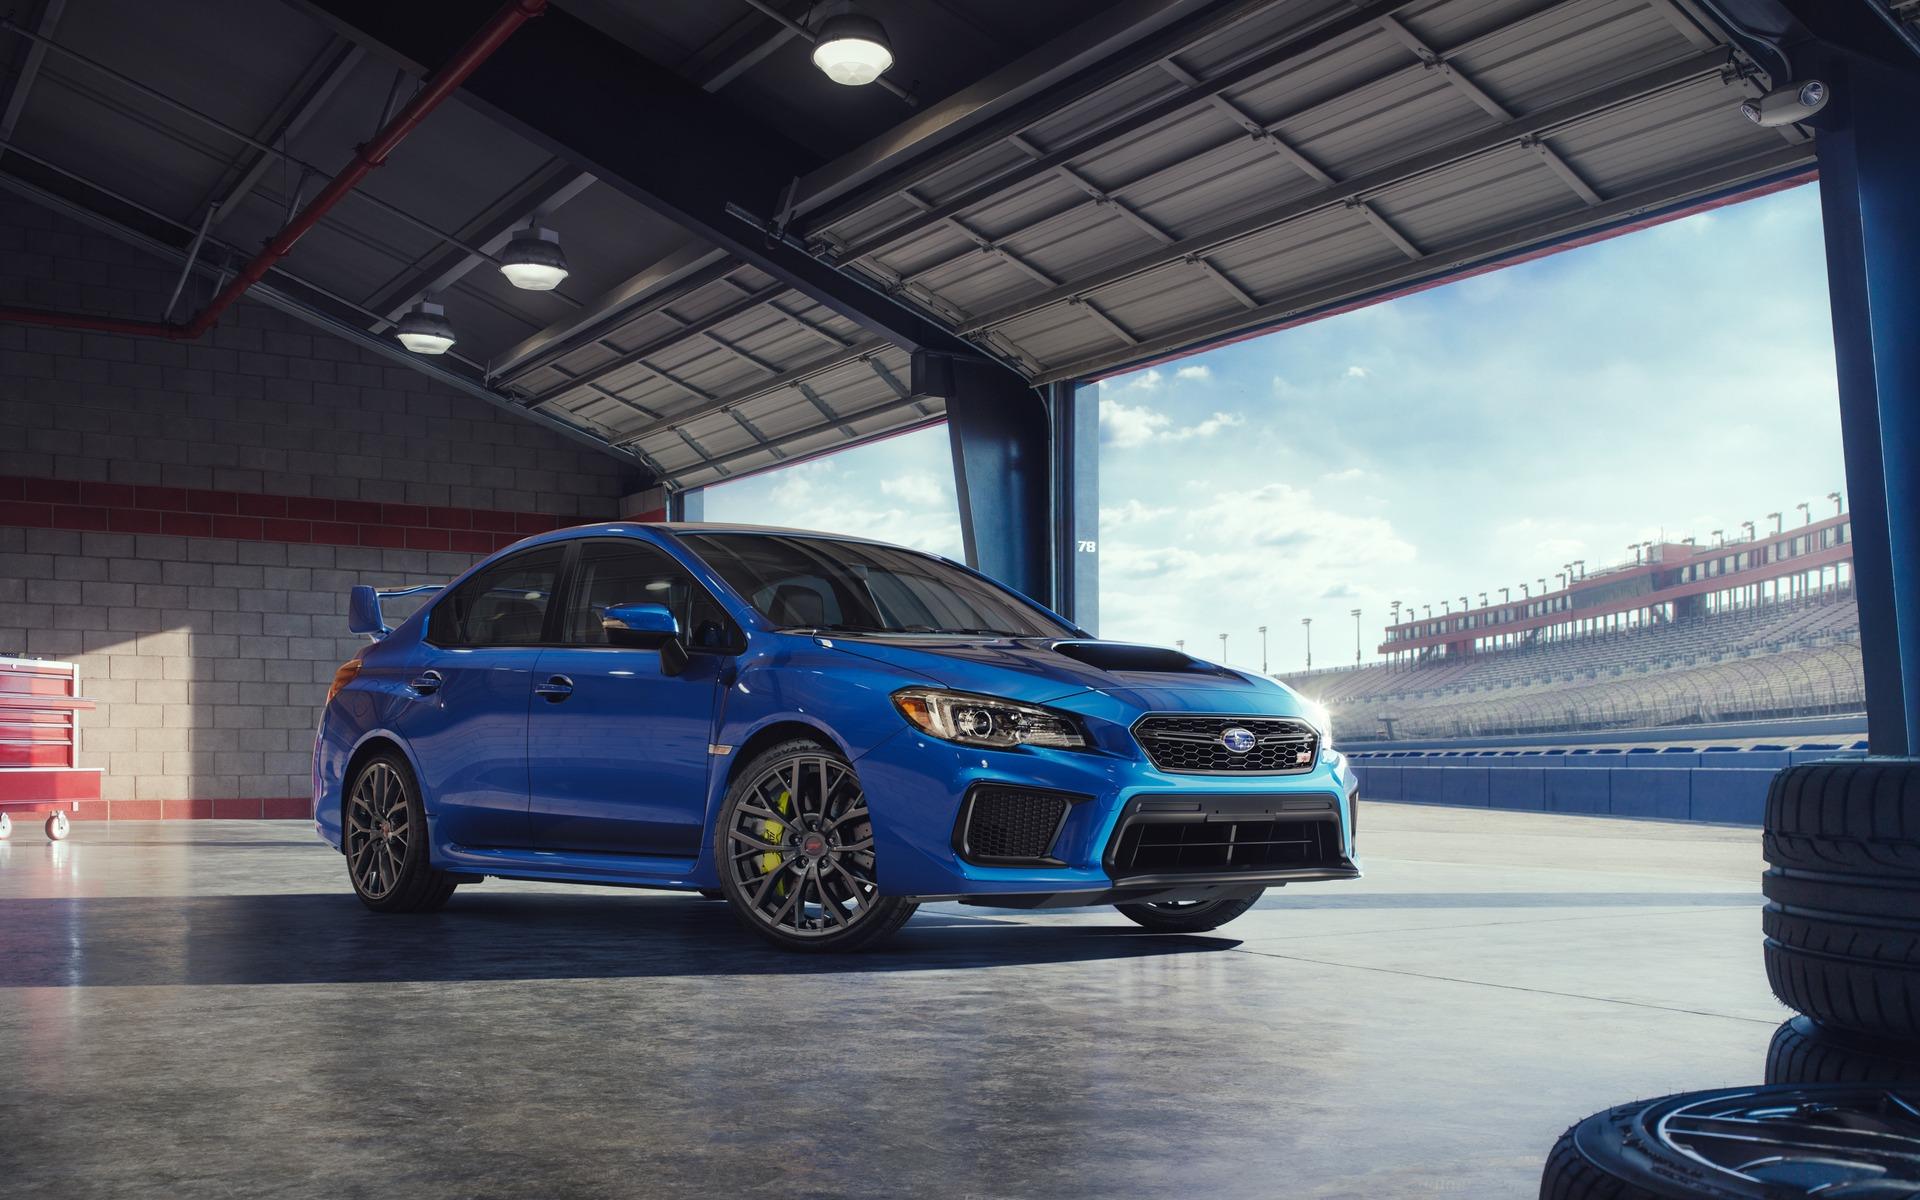 2019 Subaru Wrx And Wrx Sti Same Base Price More Connectivity